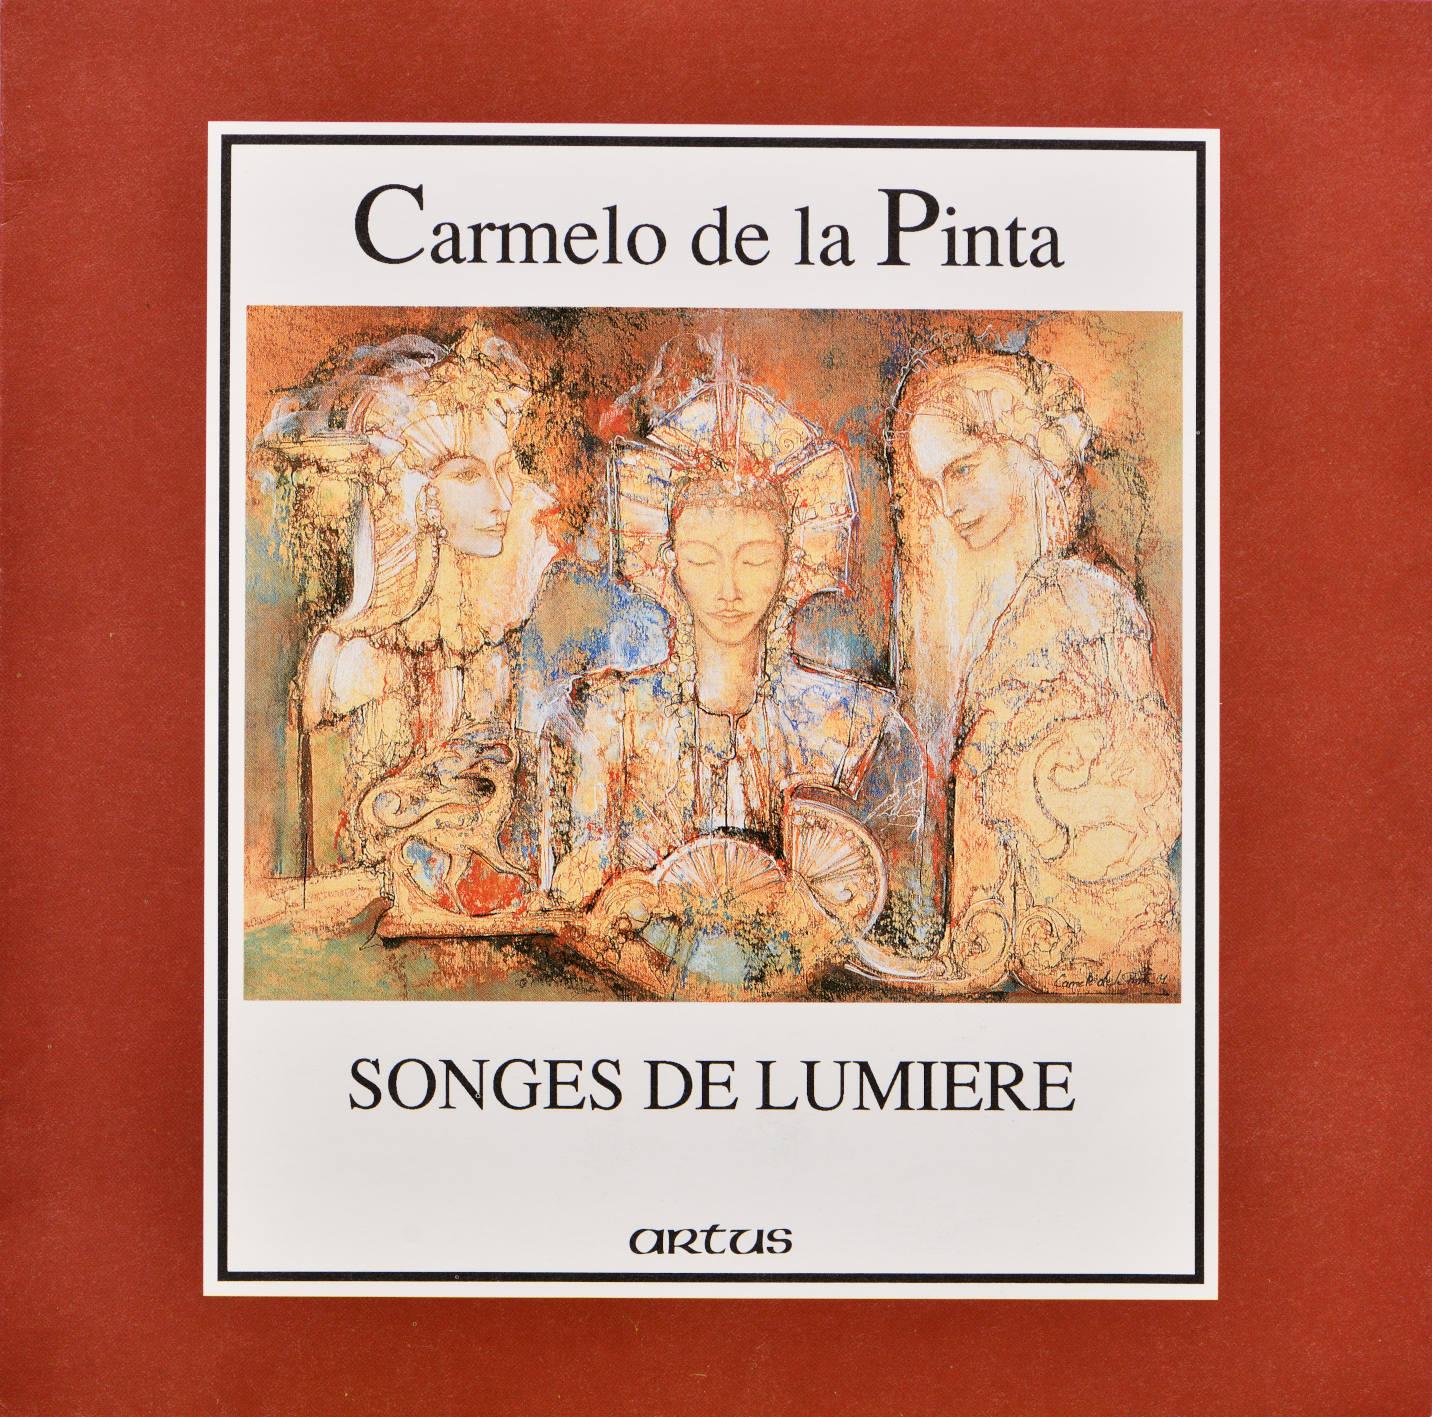 Carmelo de la Pinta - Songes de Lumière - Artus .jpg